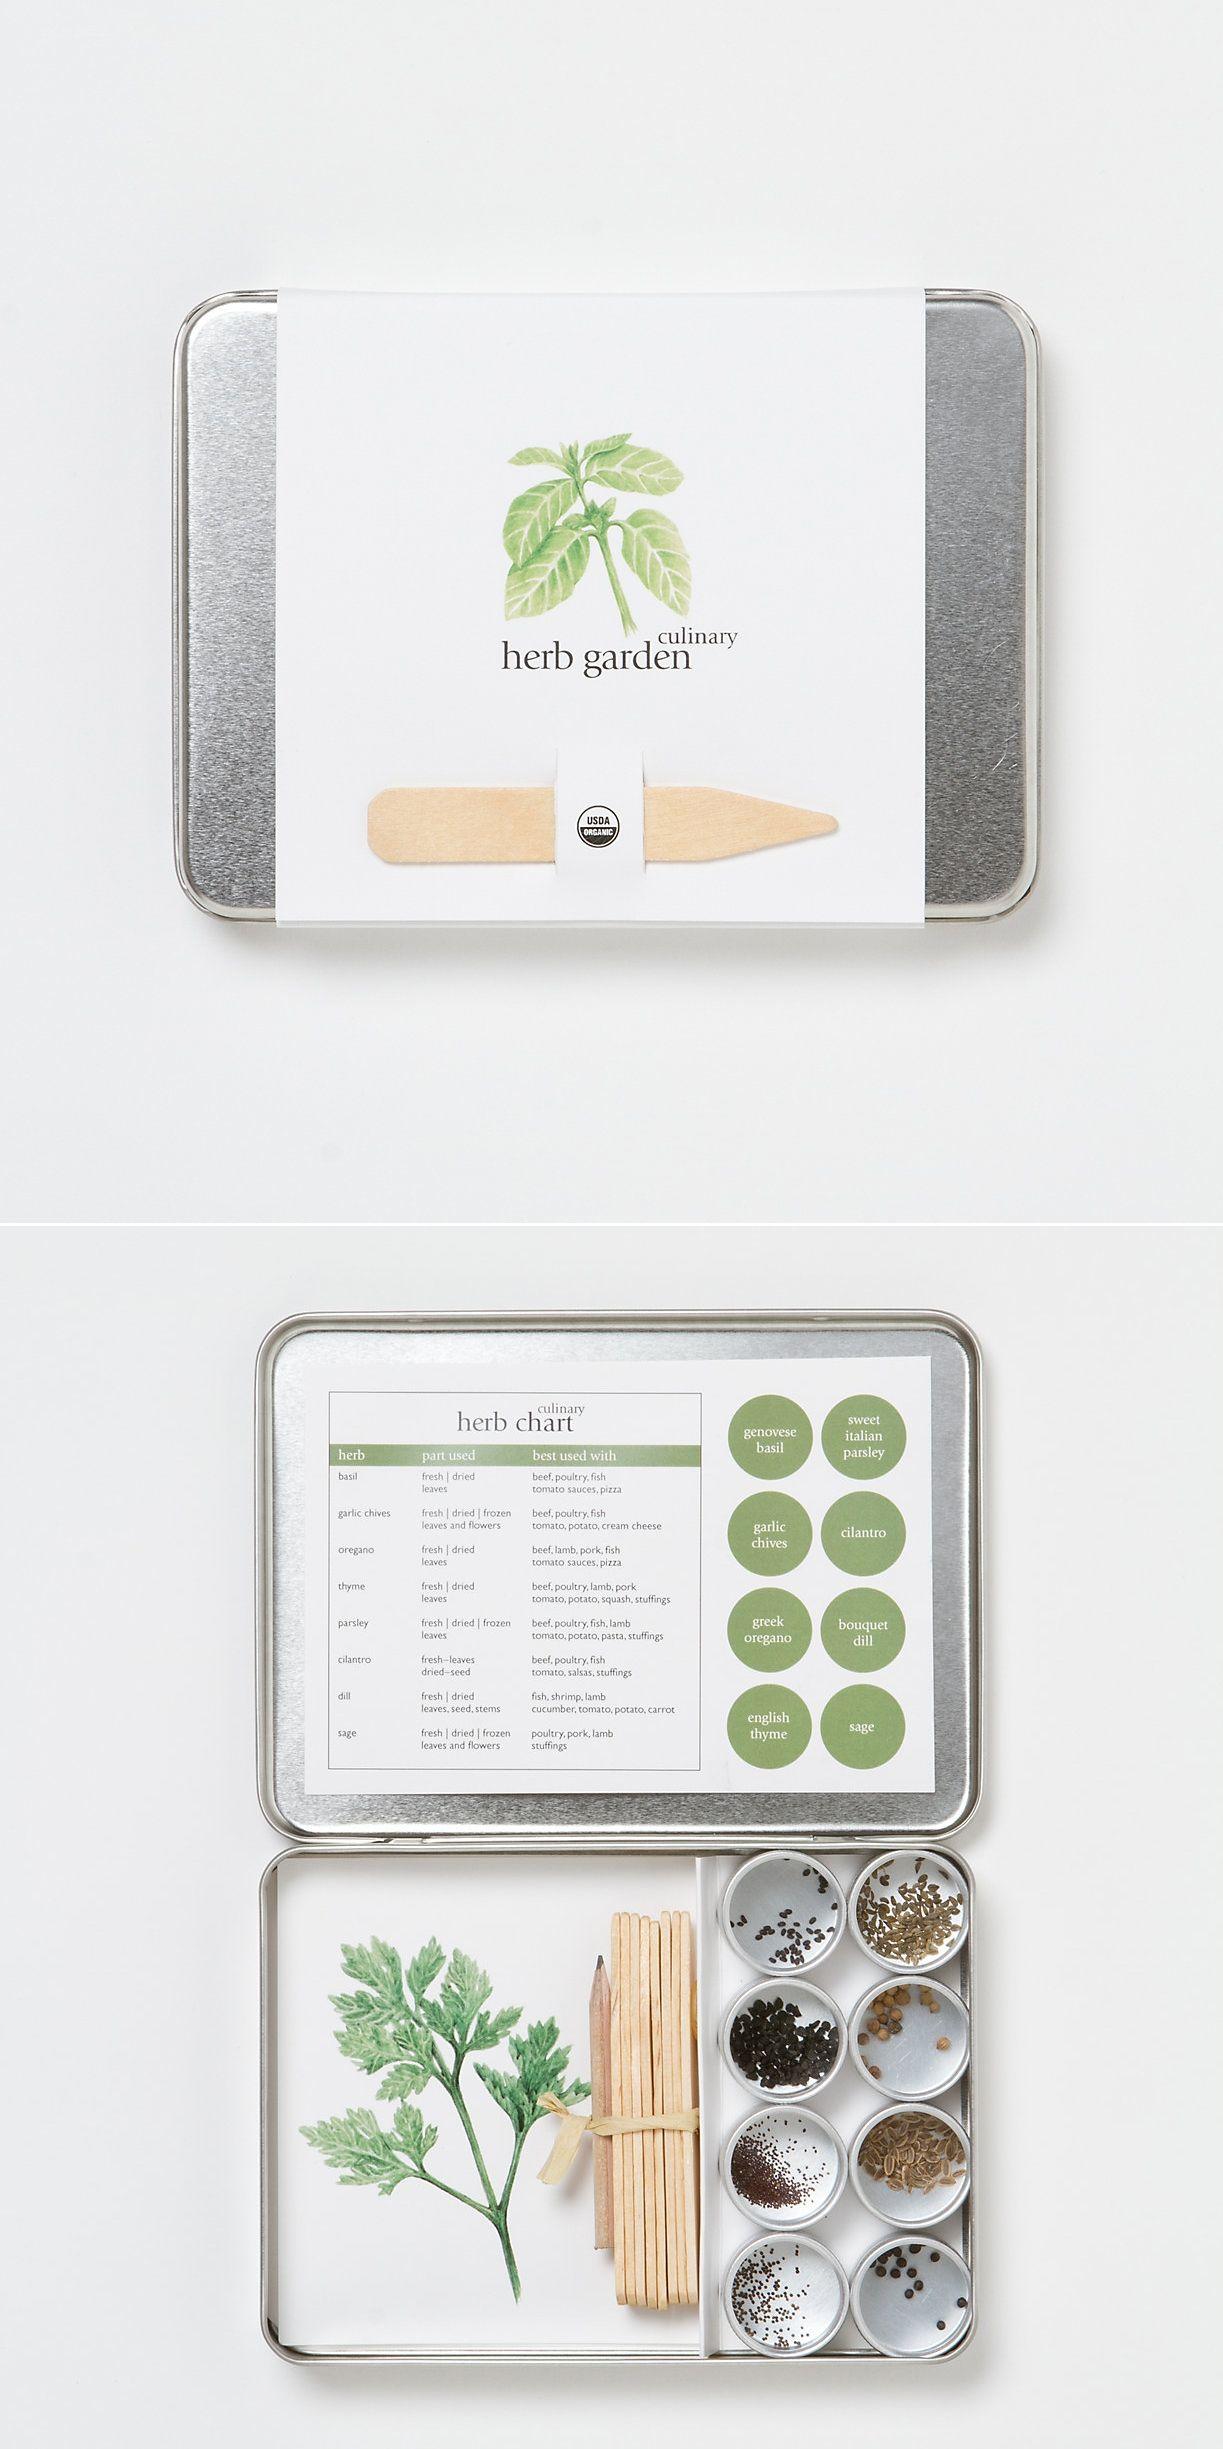 Beau Organic Herb Garden Kit By Terrain